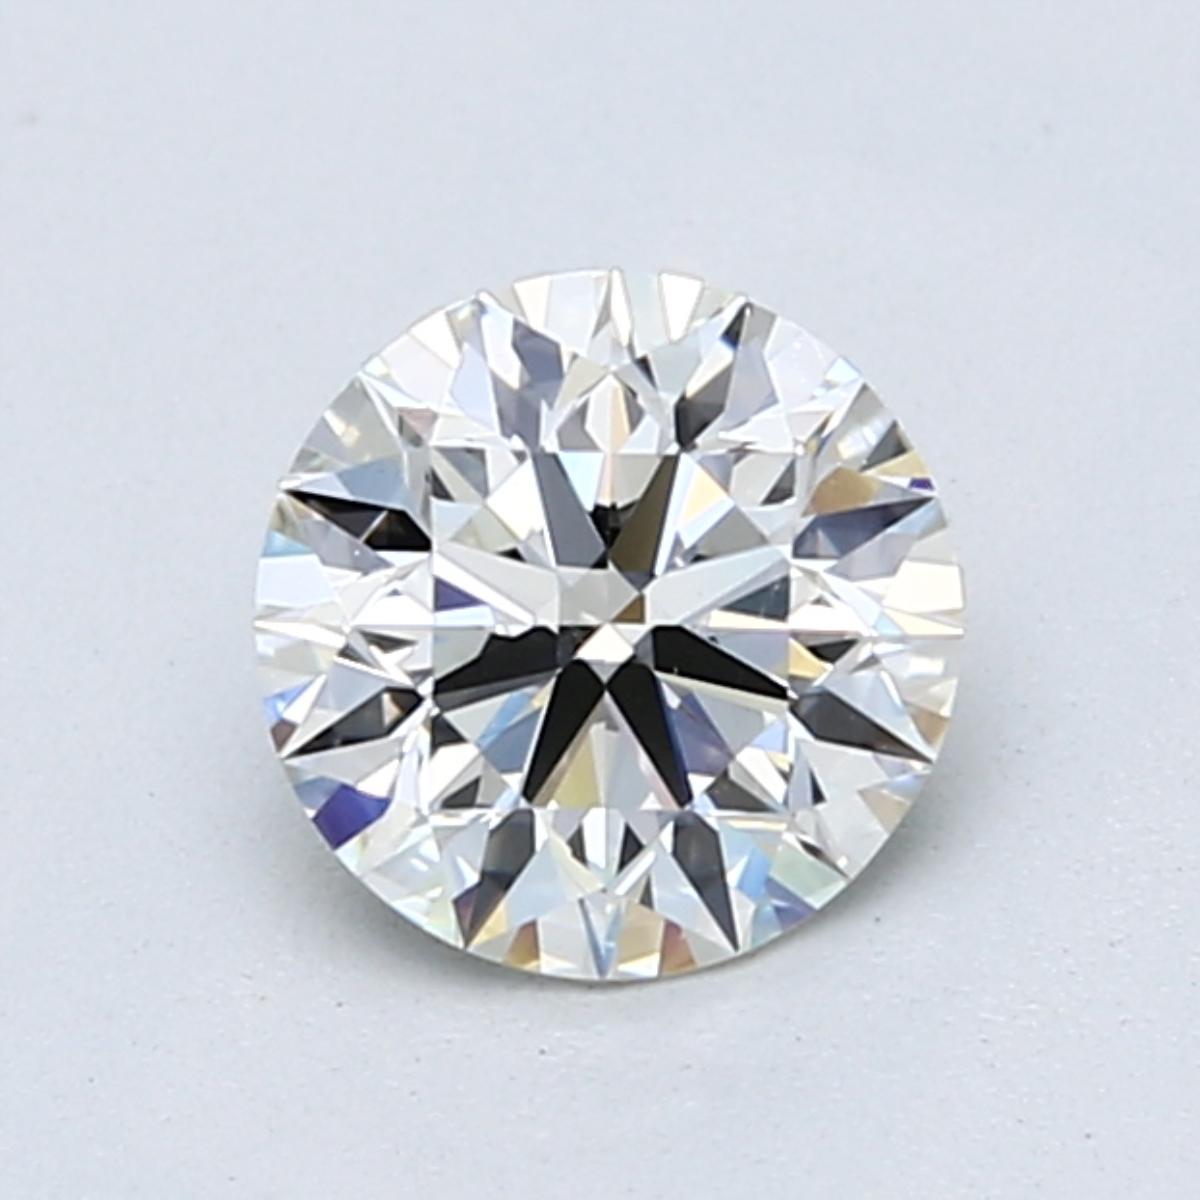 J Color Diamonds Are They Good Or Bad Stonealgo Stonealgo